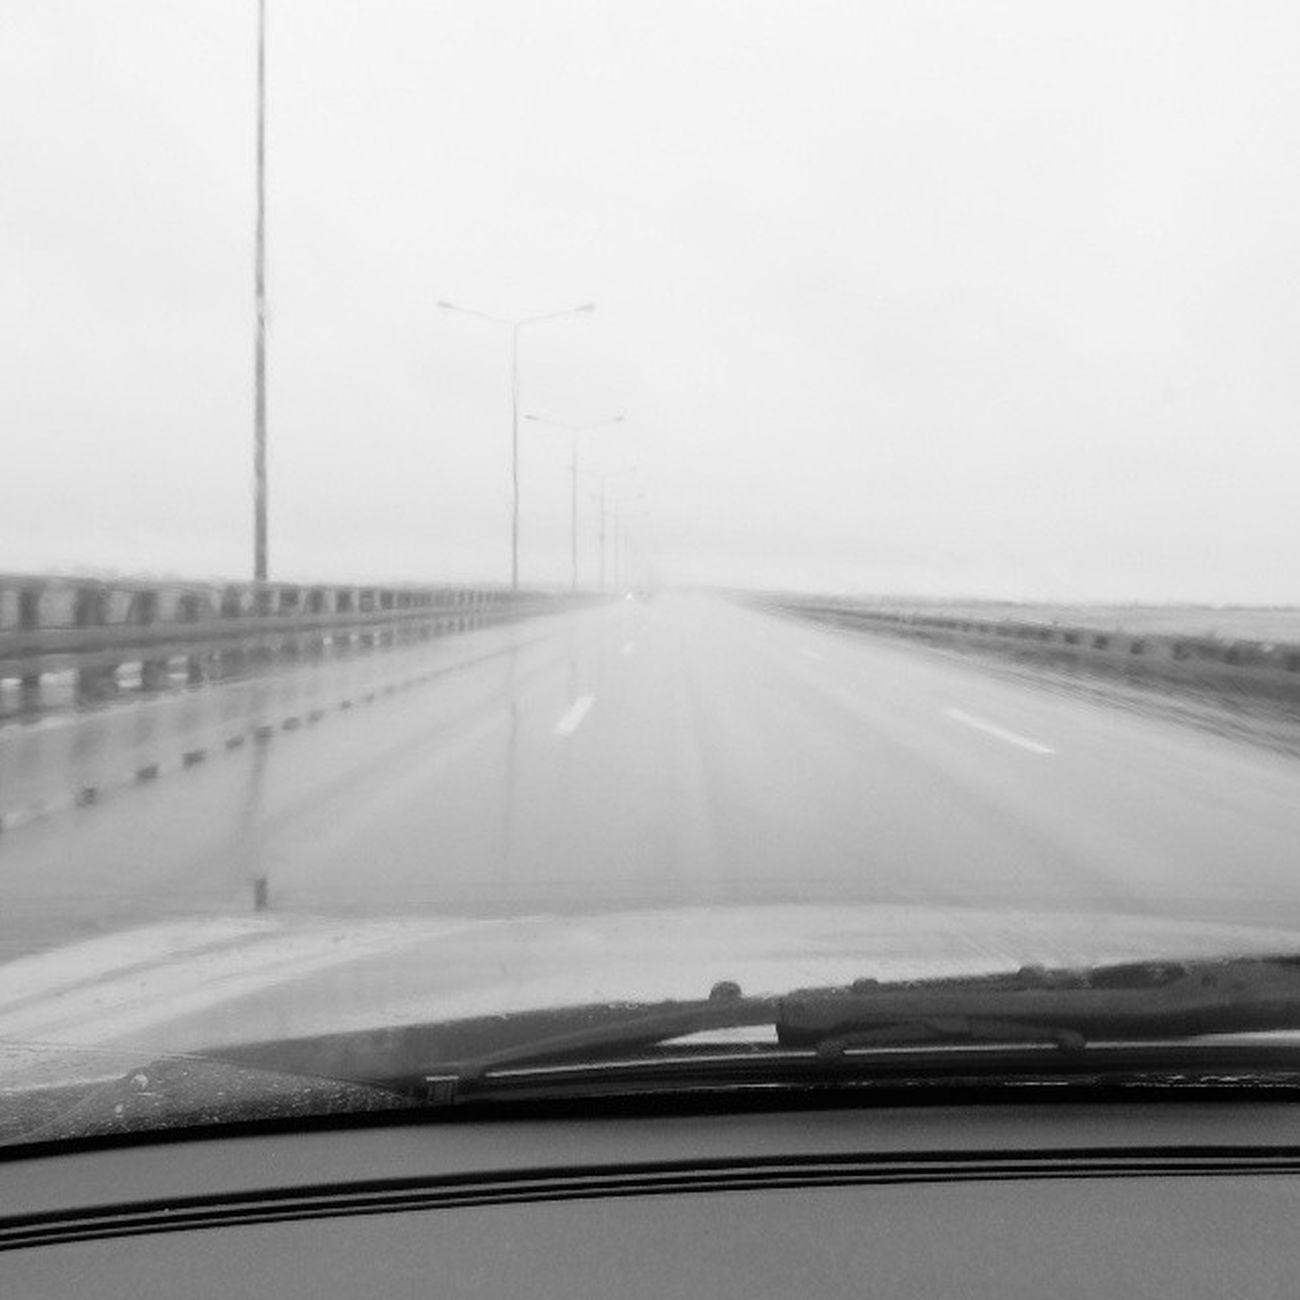 Дамба , Дождь , тоска . графично ! чб трасса vkpost road bw blacknwhite rain damb graphics frommycar страхиненависть